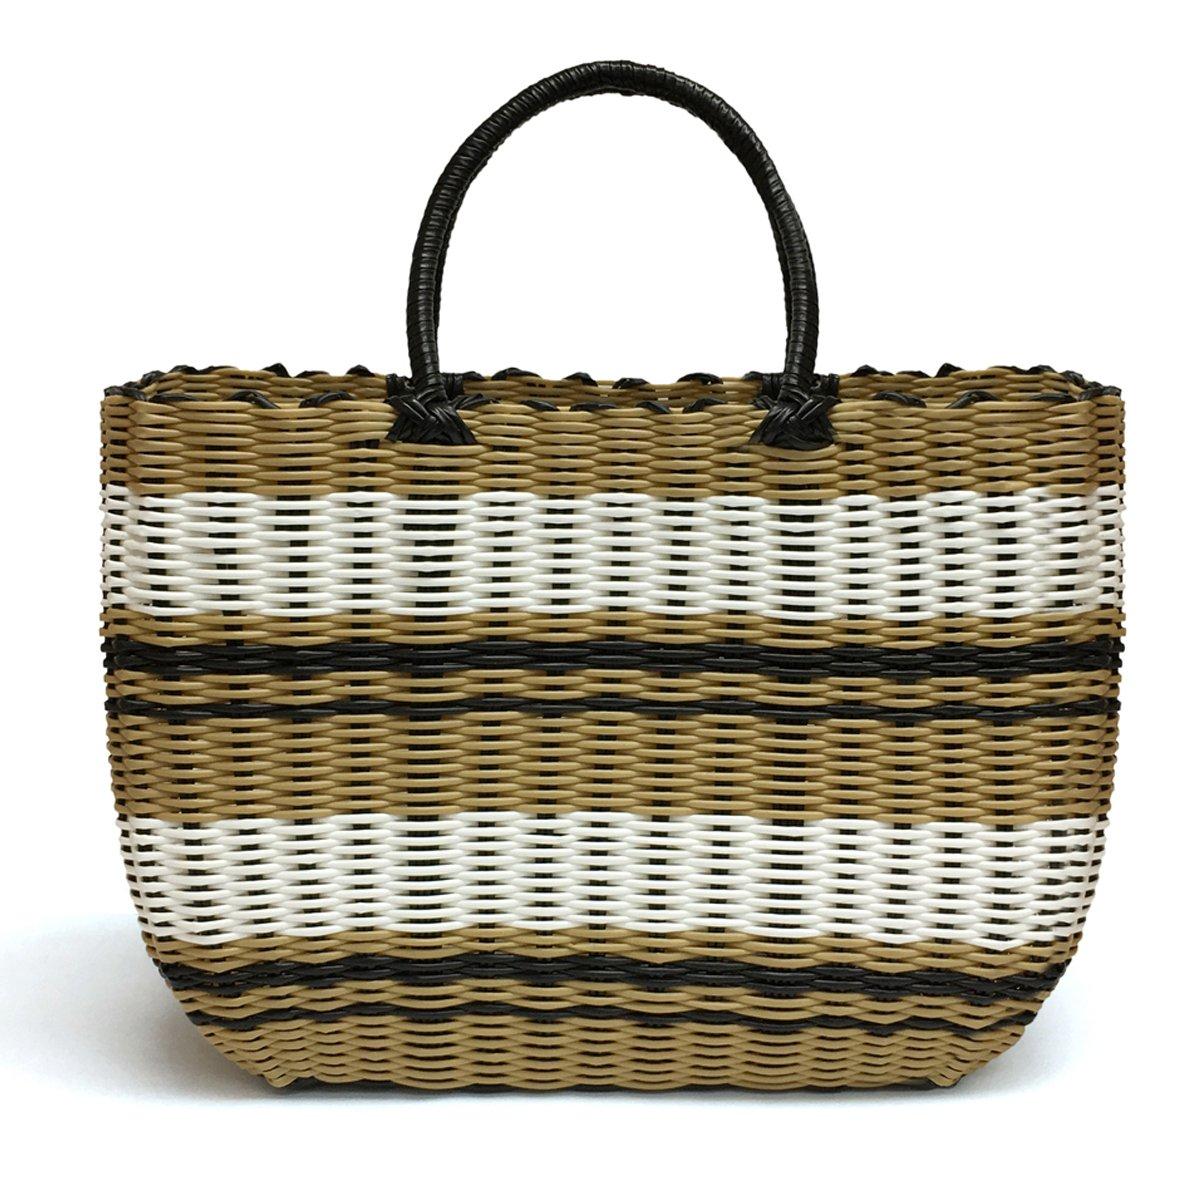 Amazon.com: Bambou - Bolsa de playa impermeable para mujer ...